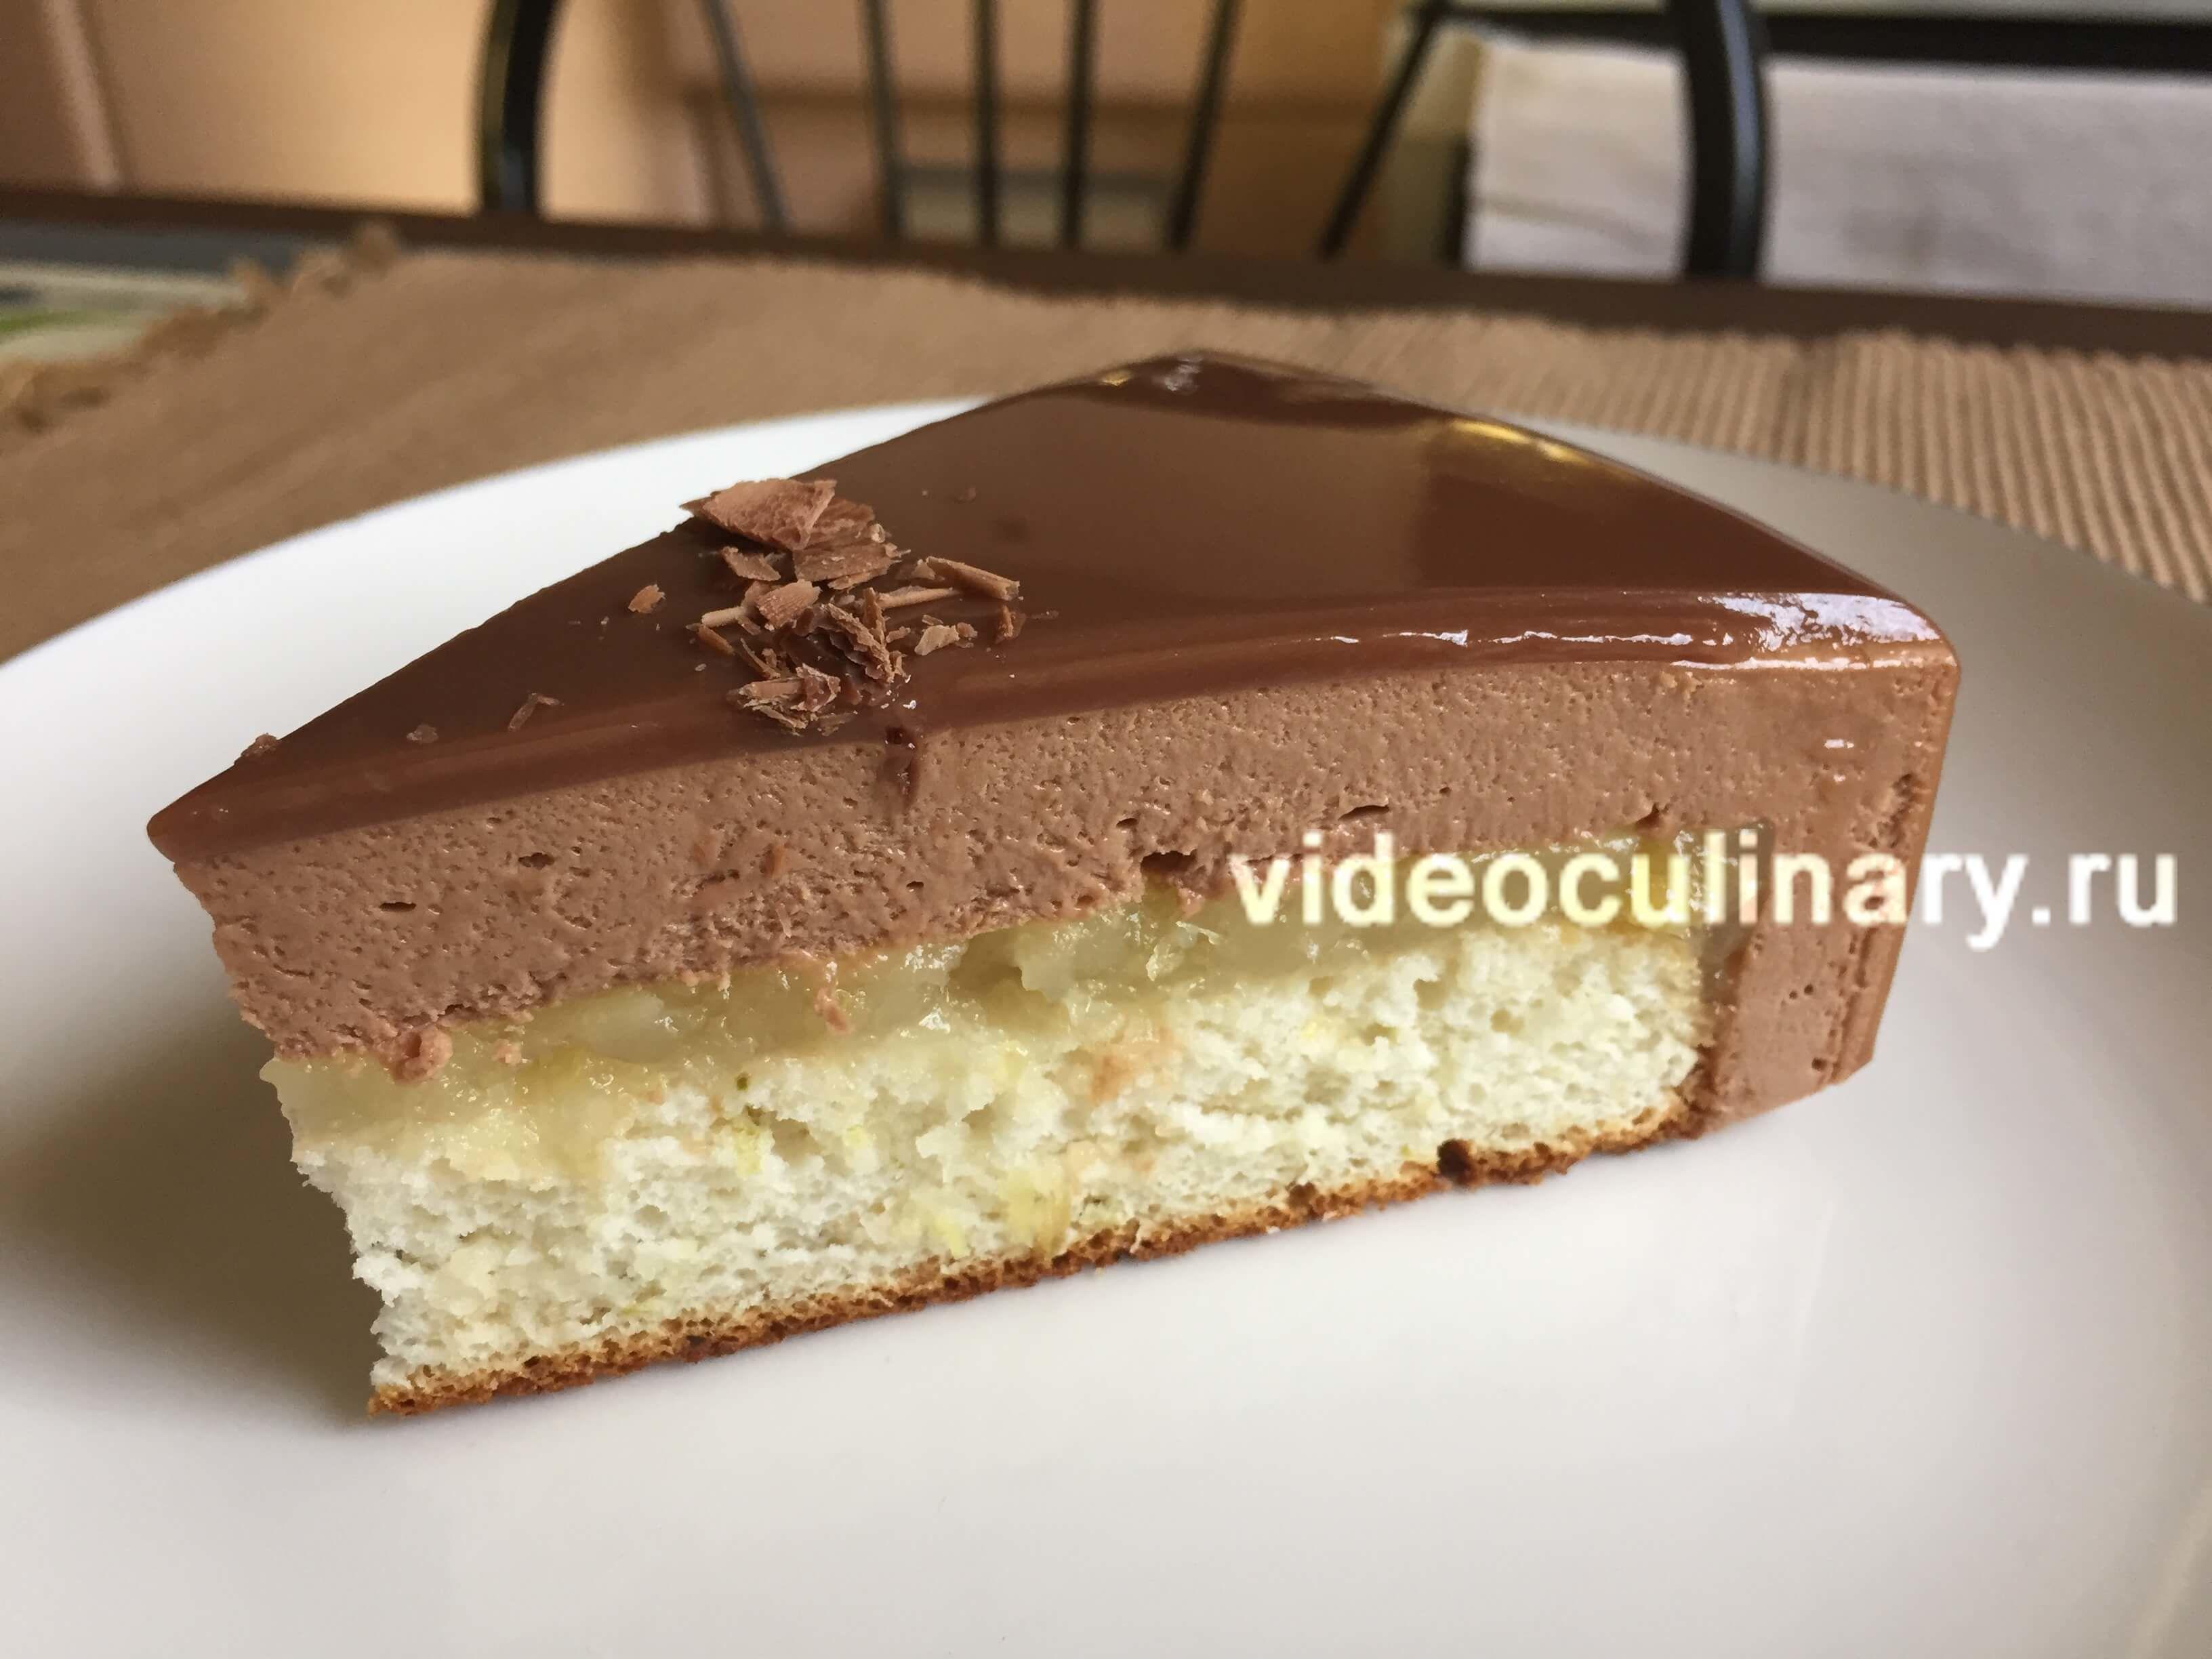 Муссовый торт Шоколад-имбирь-лайм